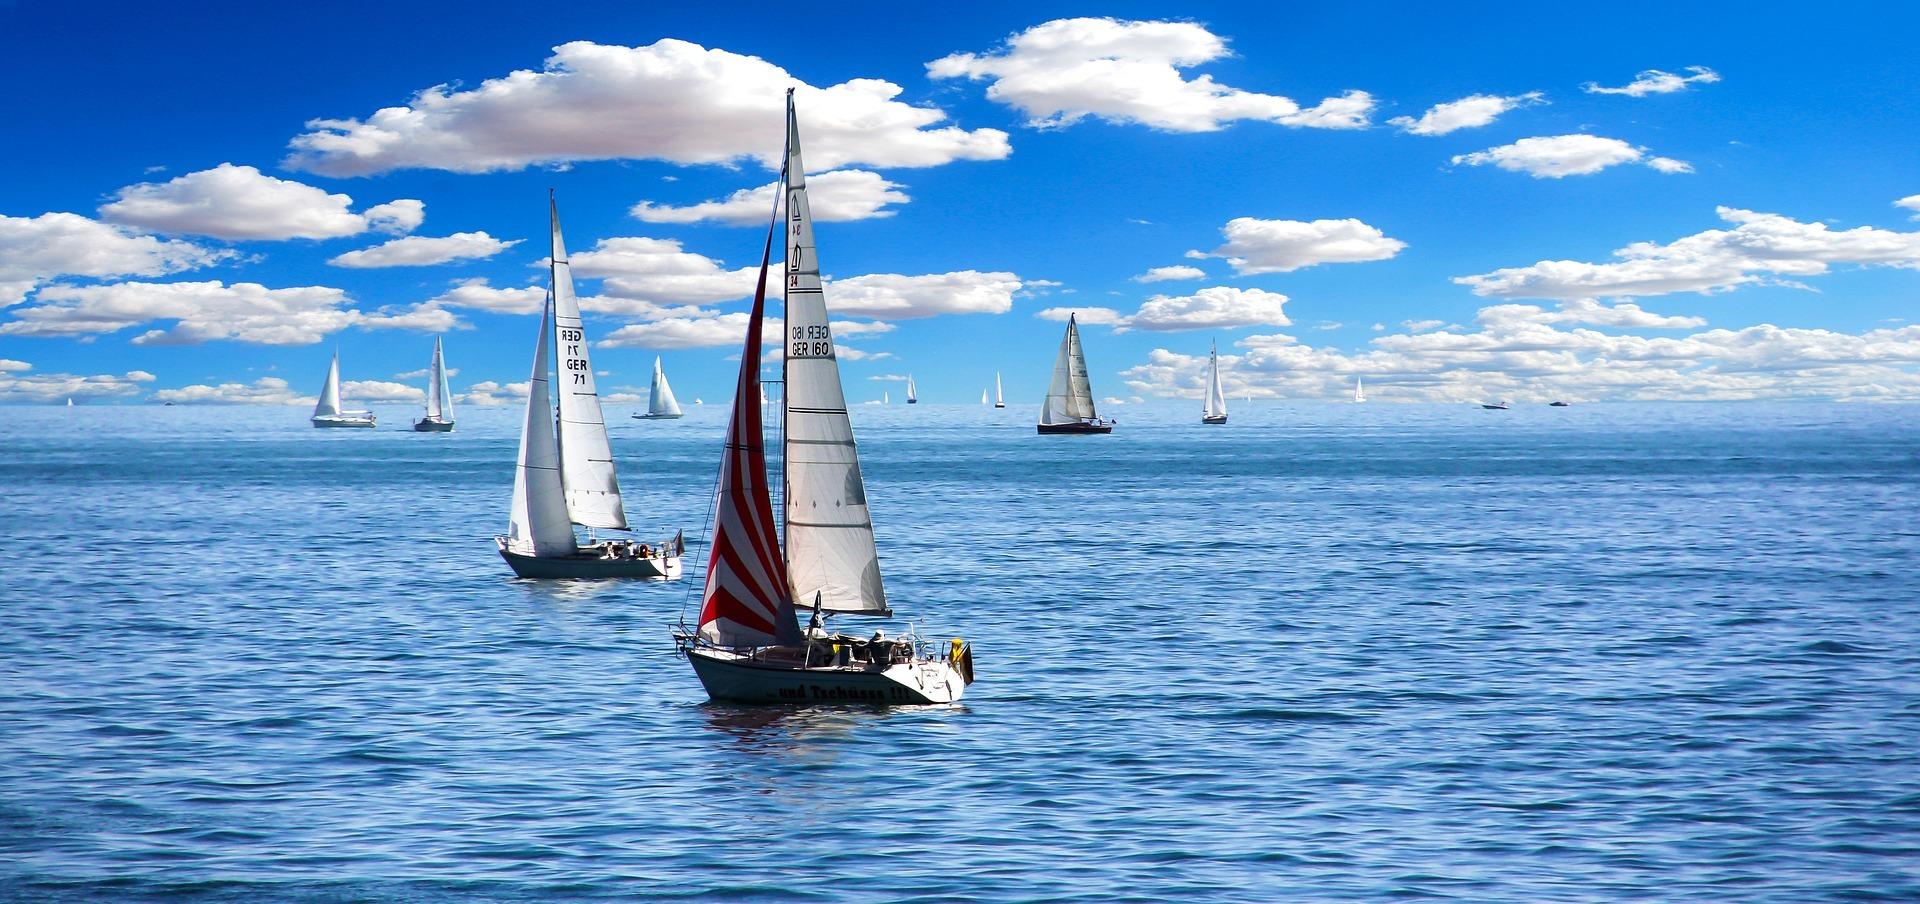 sailing-boat-1593613_1920.jpg